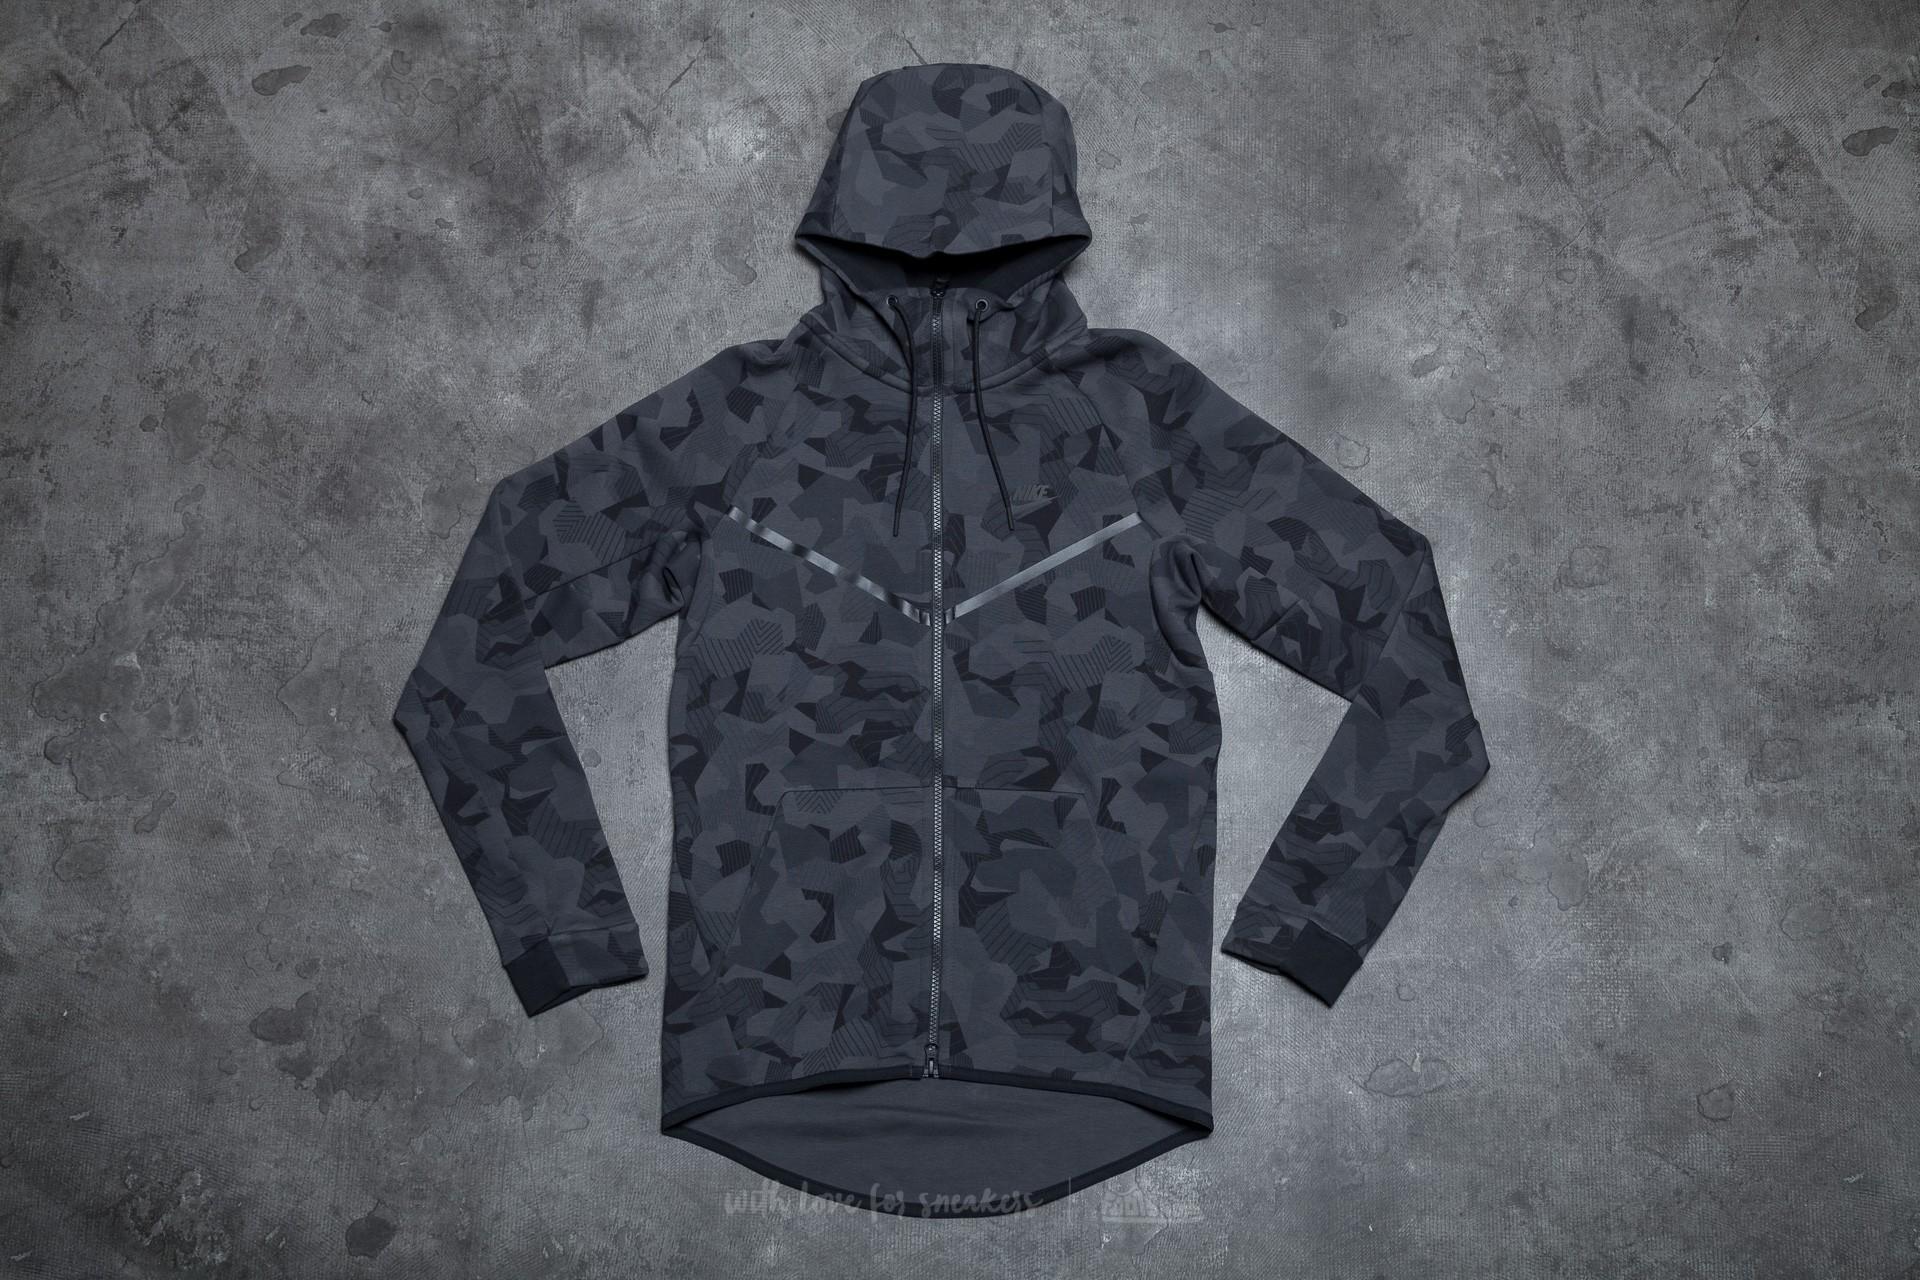 a18ce3c6f0b1 Nike Sportswear Tech Fleece Windrunner Anthracite  Black